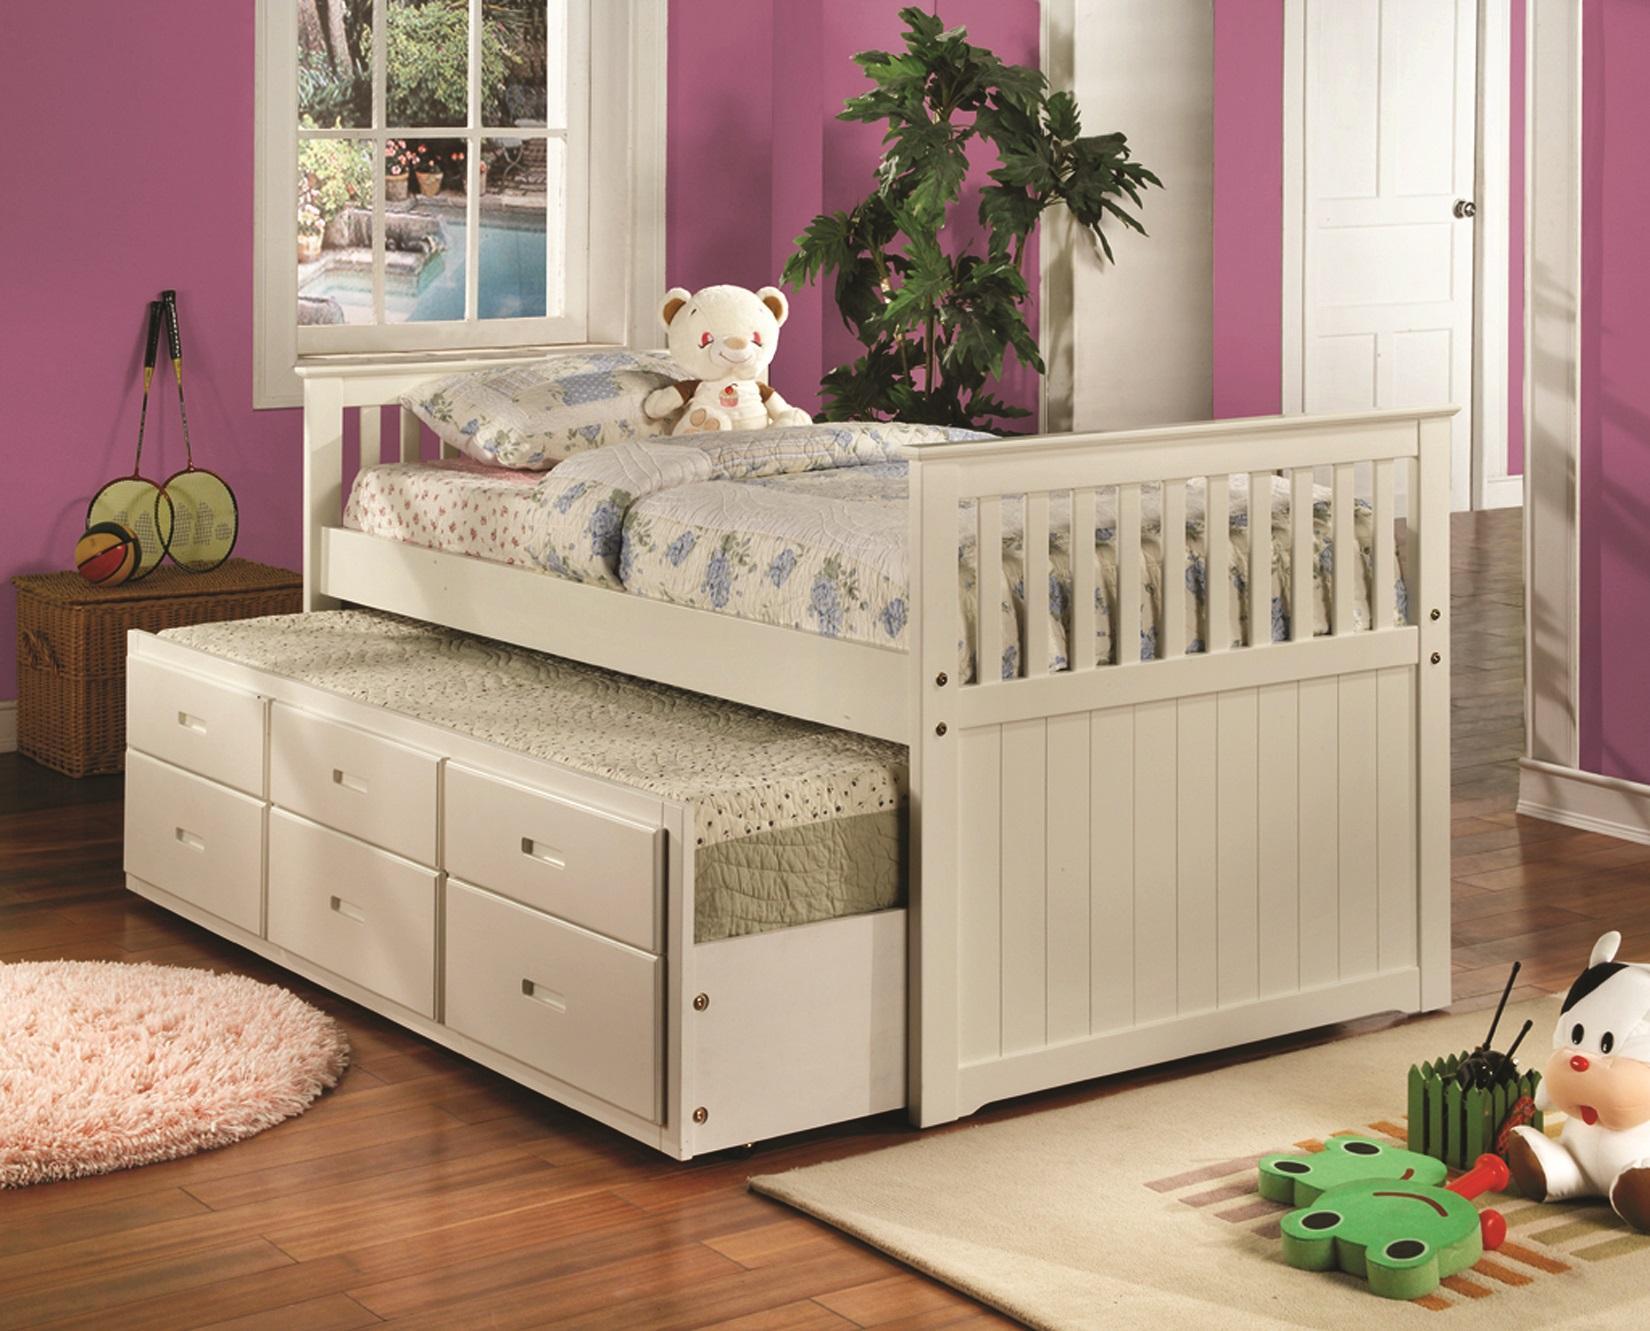 Beds Mega Furniture Imports Ltd